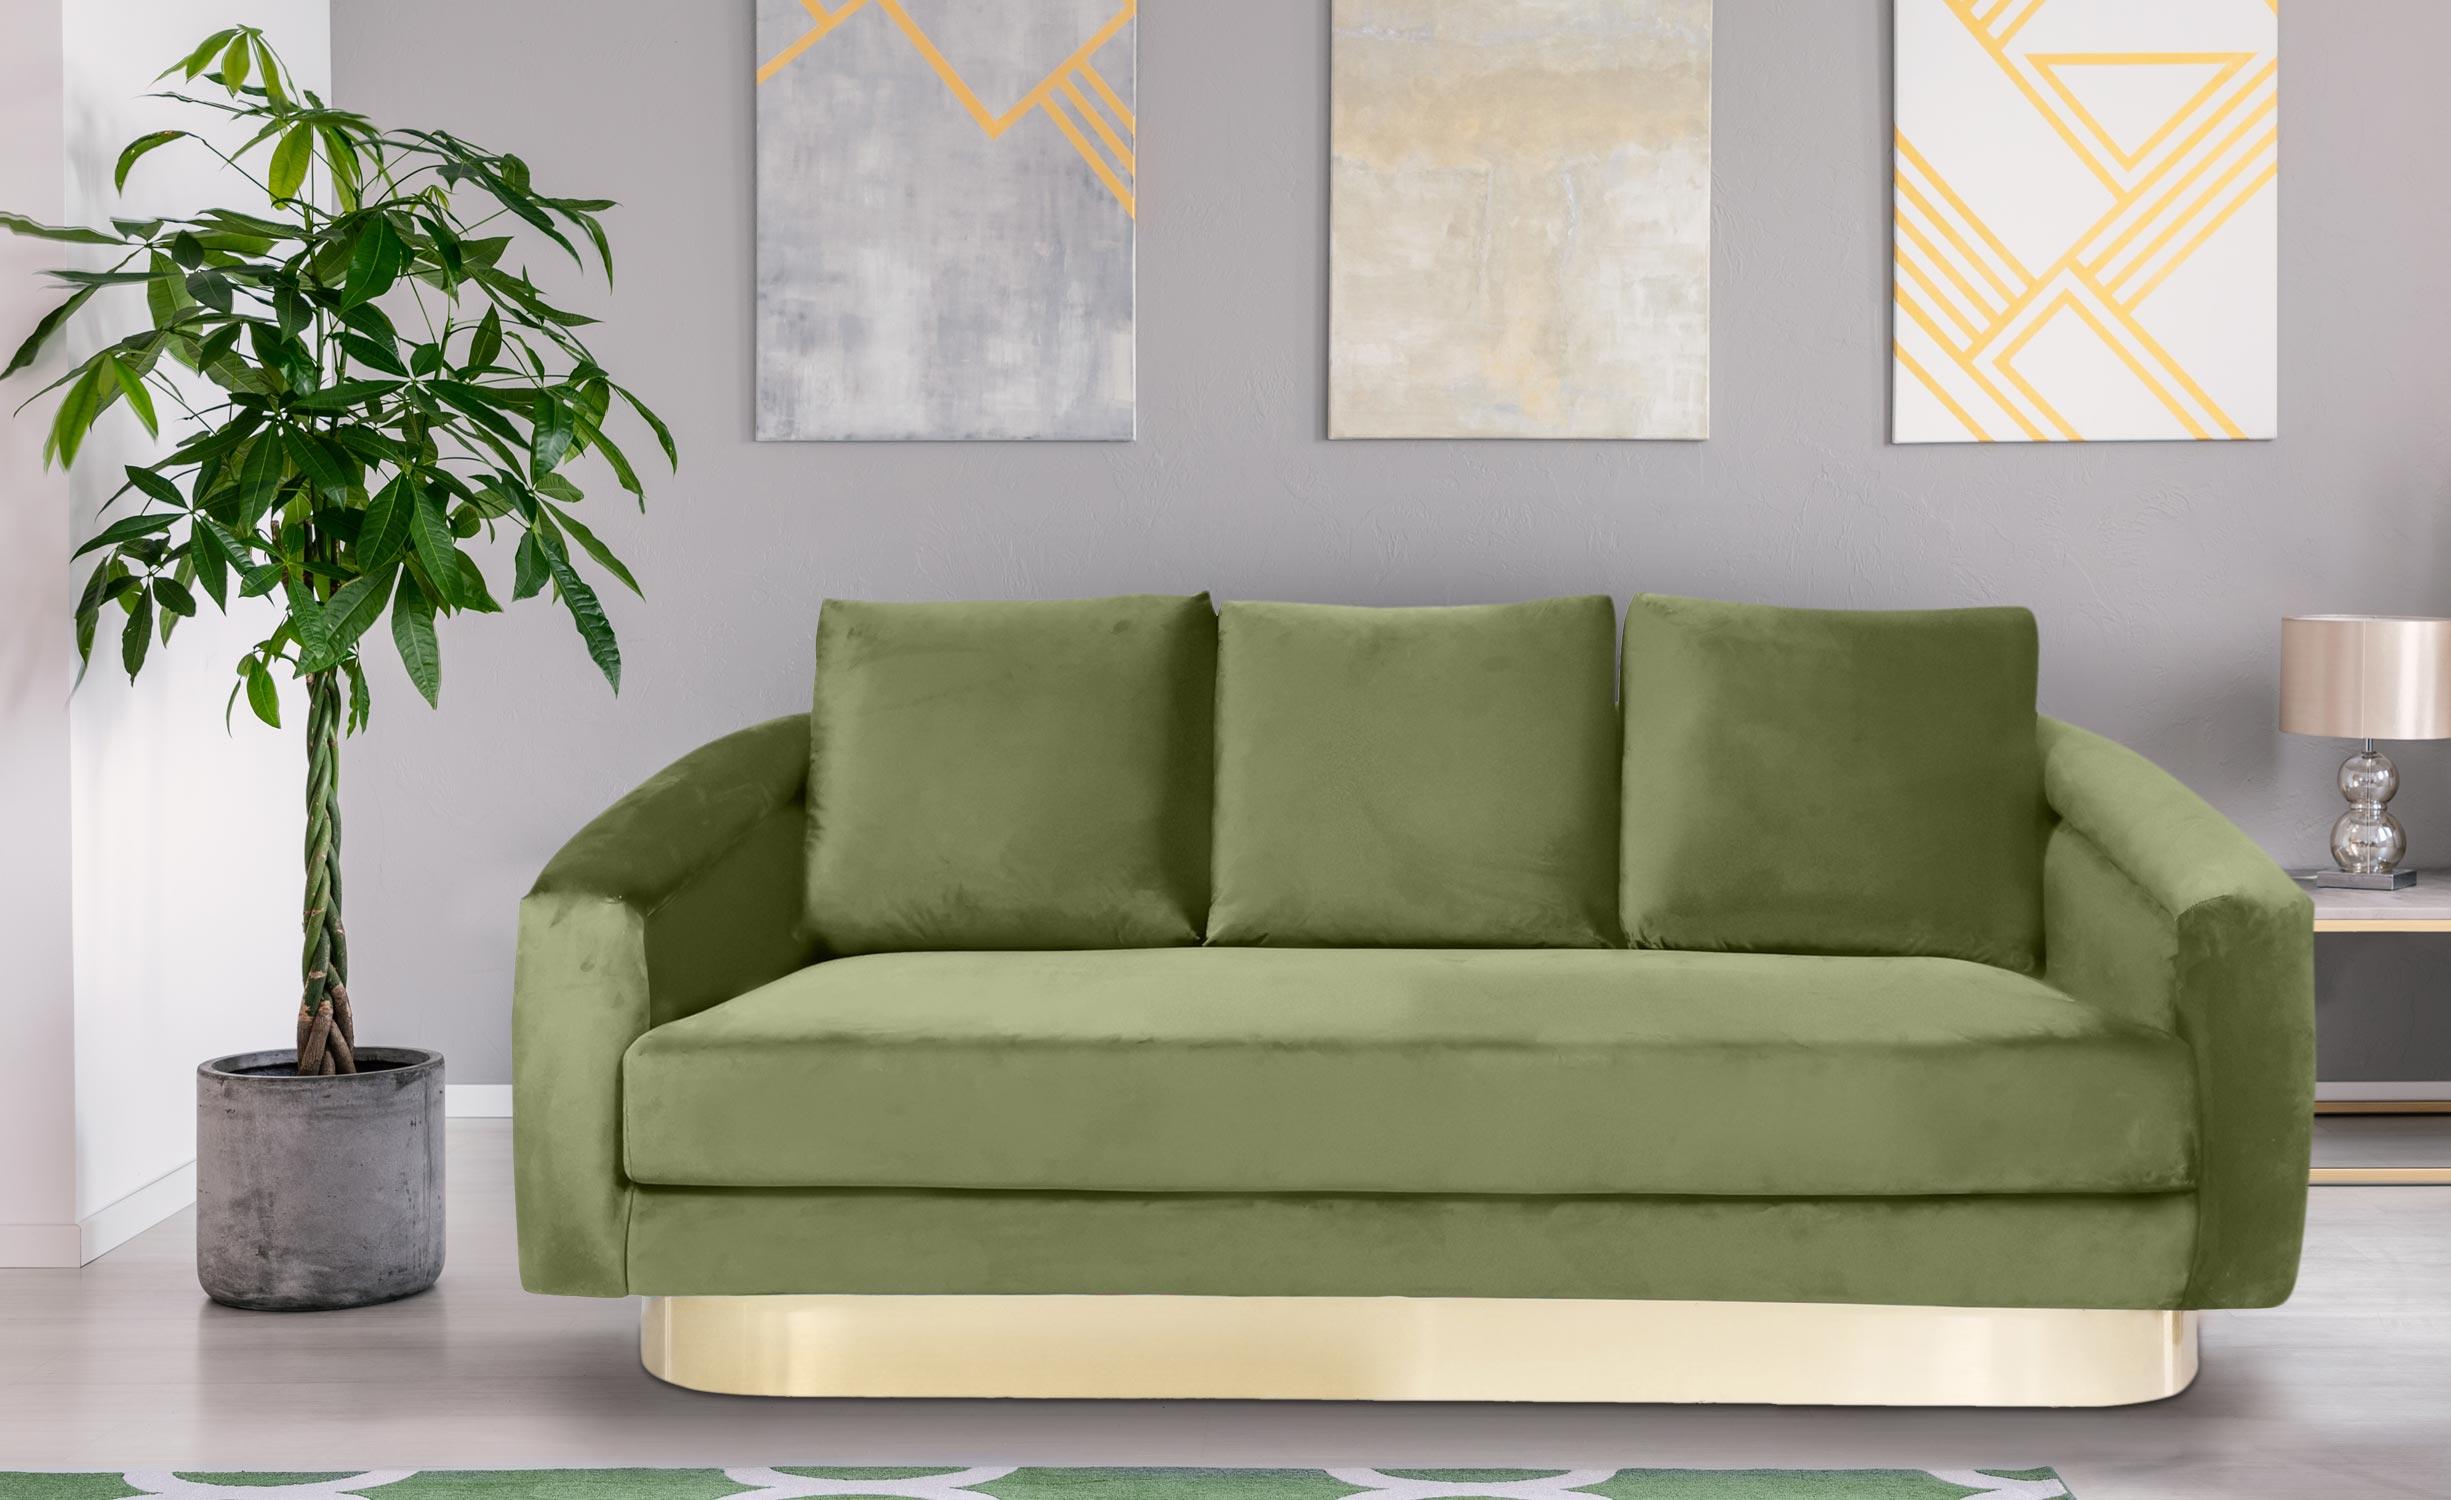 Kenpark 3-Sitzer Sofa mit Samtbezug Khaki